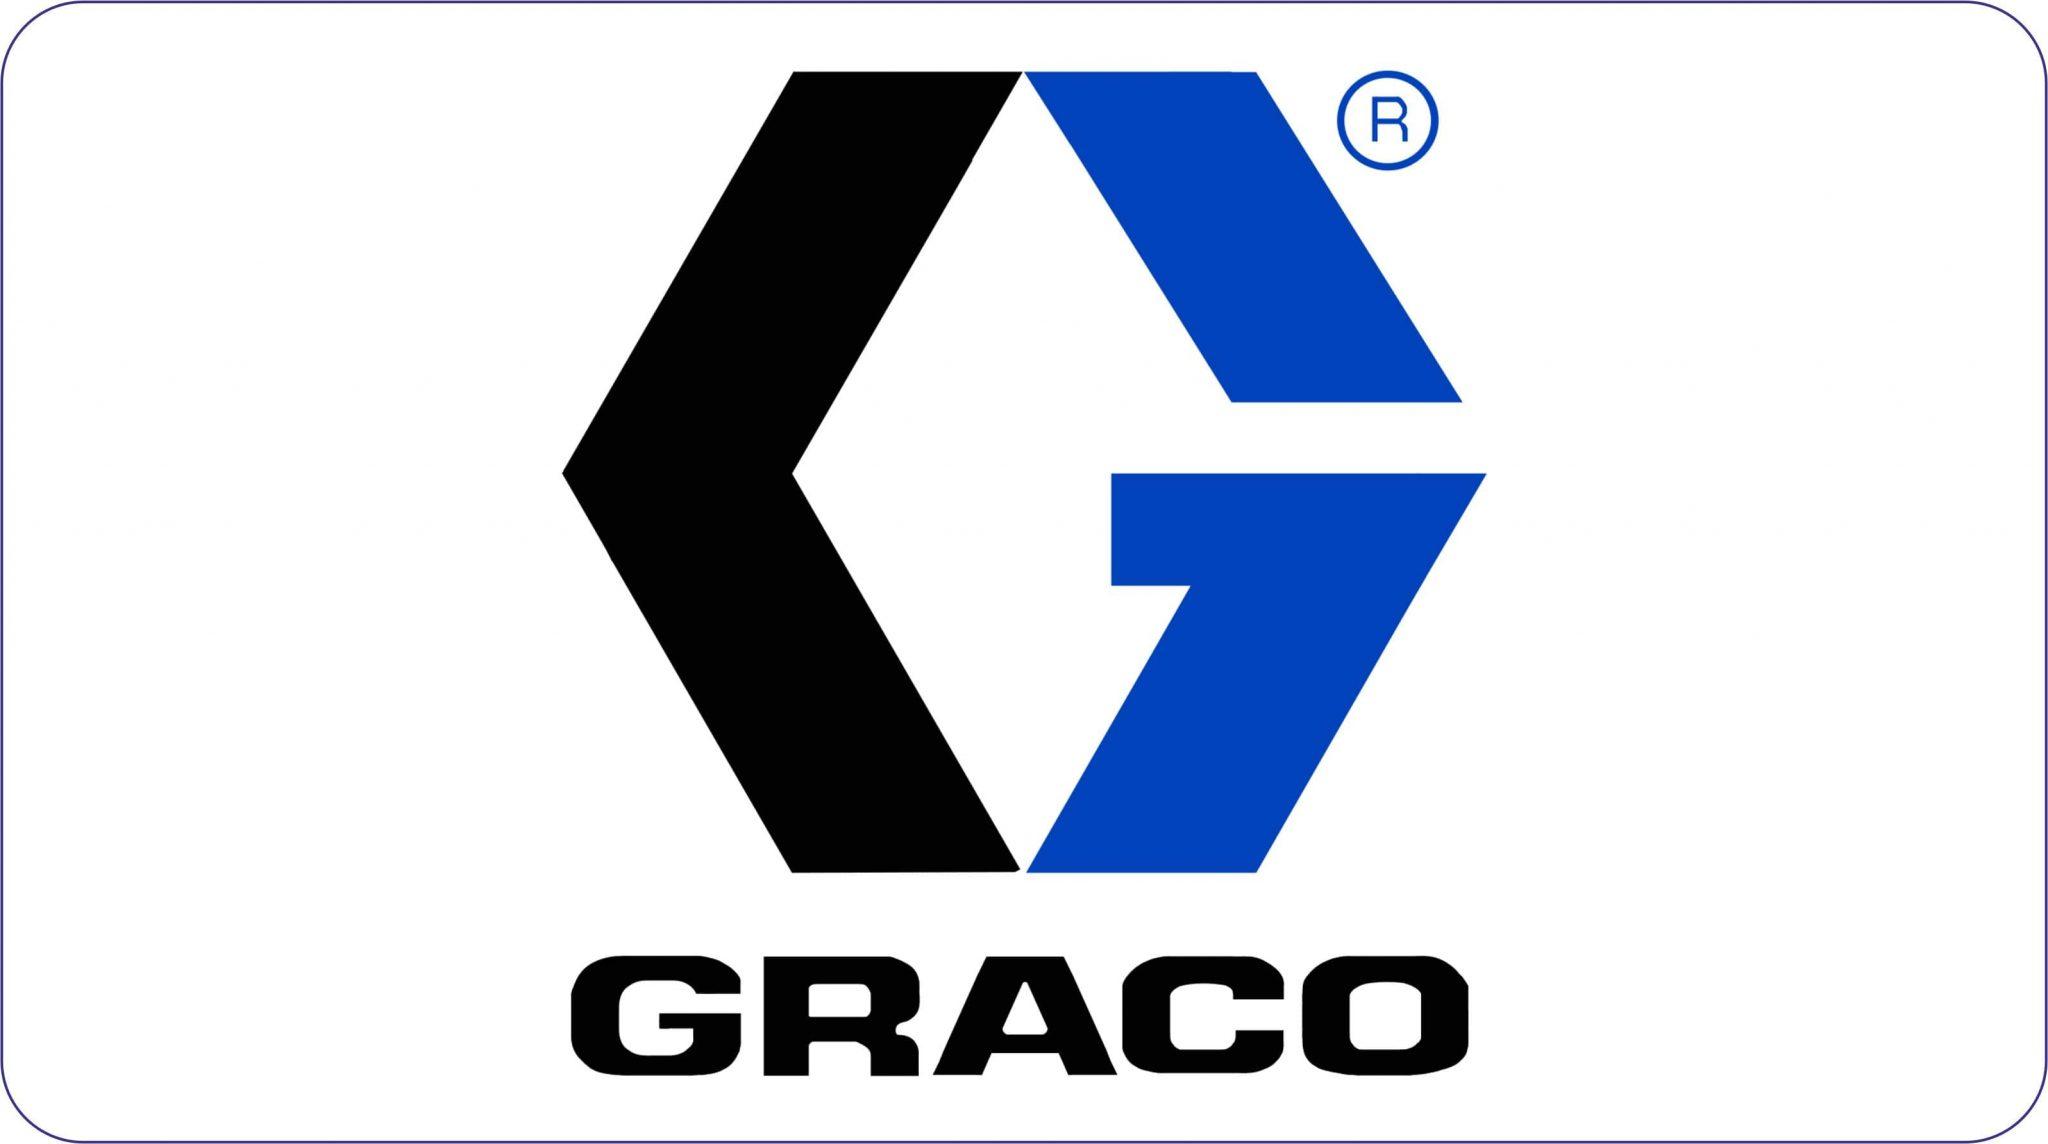 GRACO-min